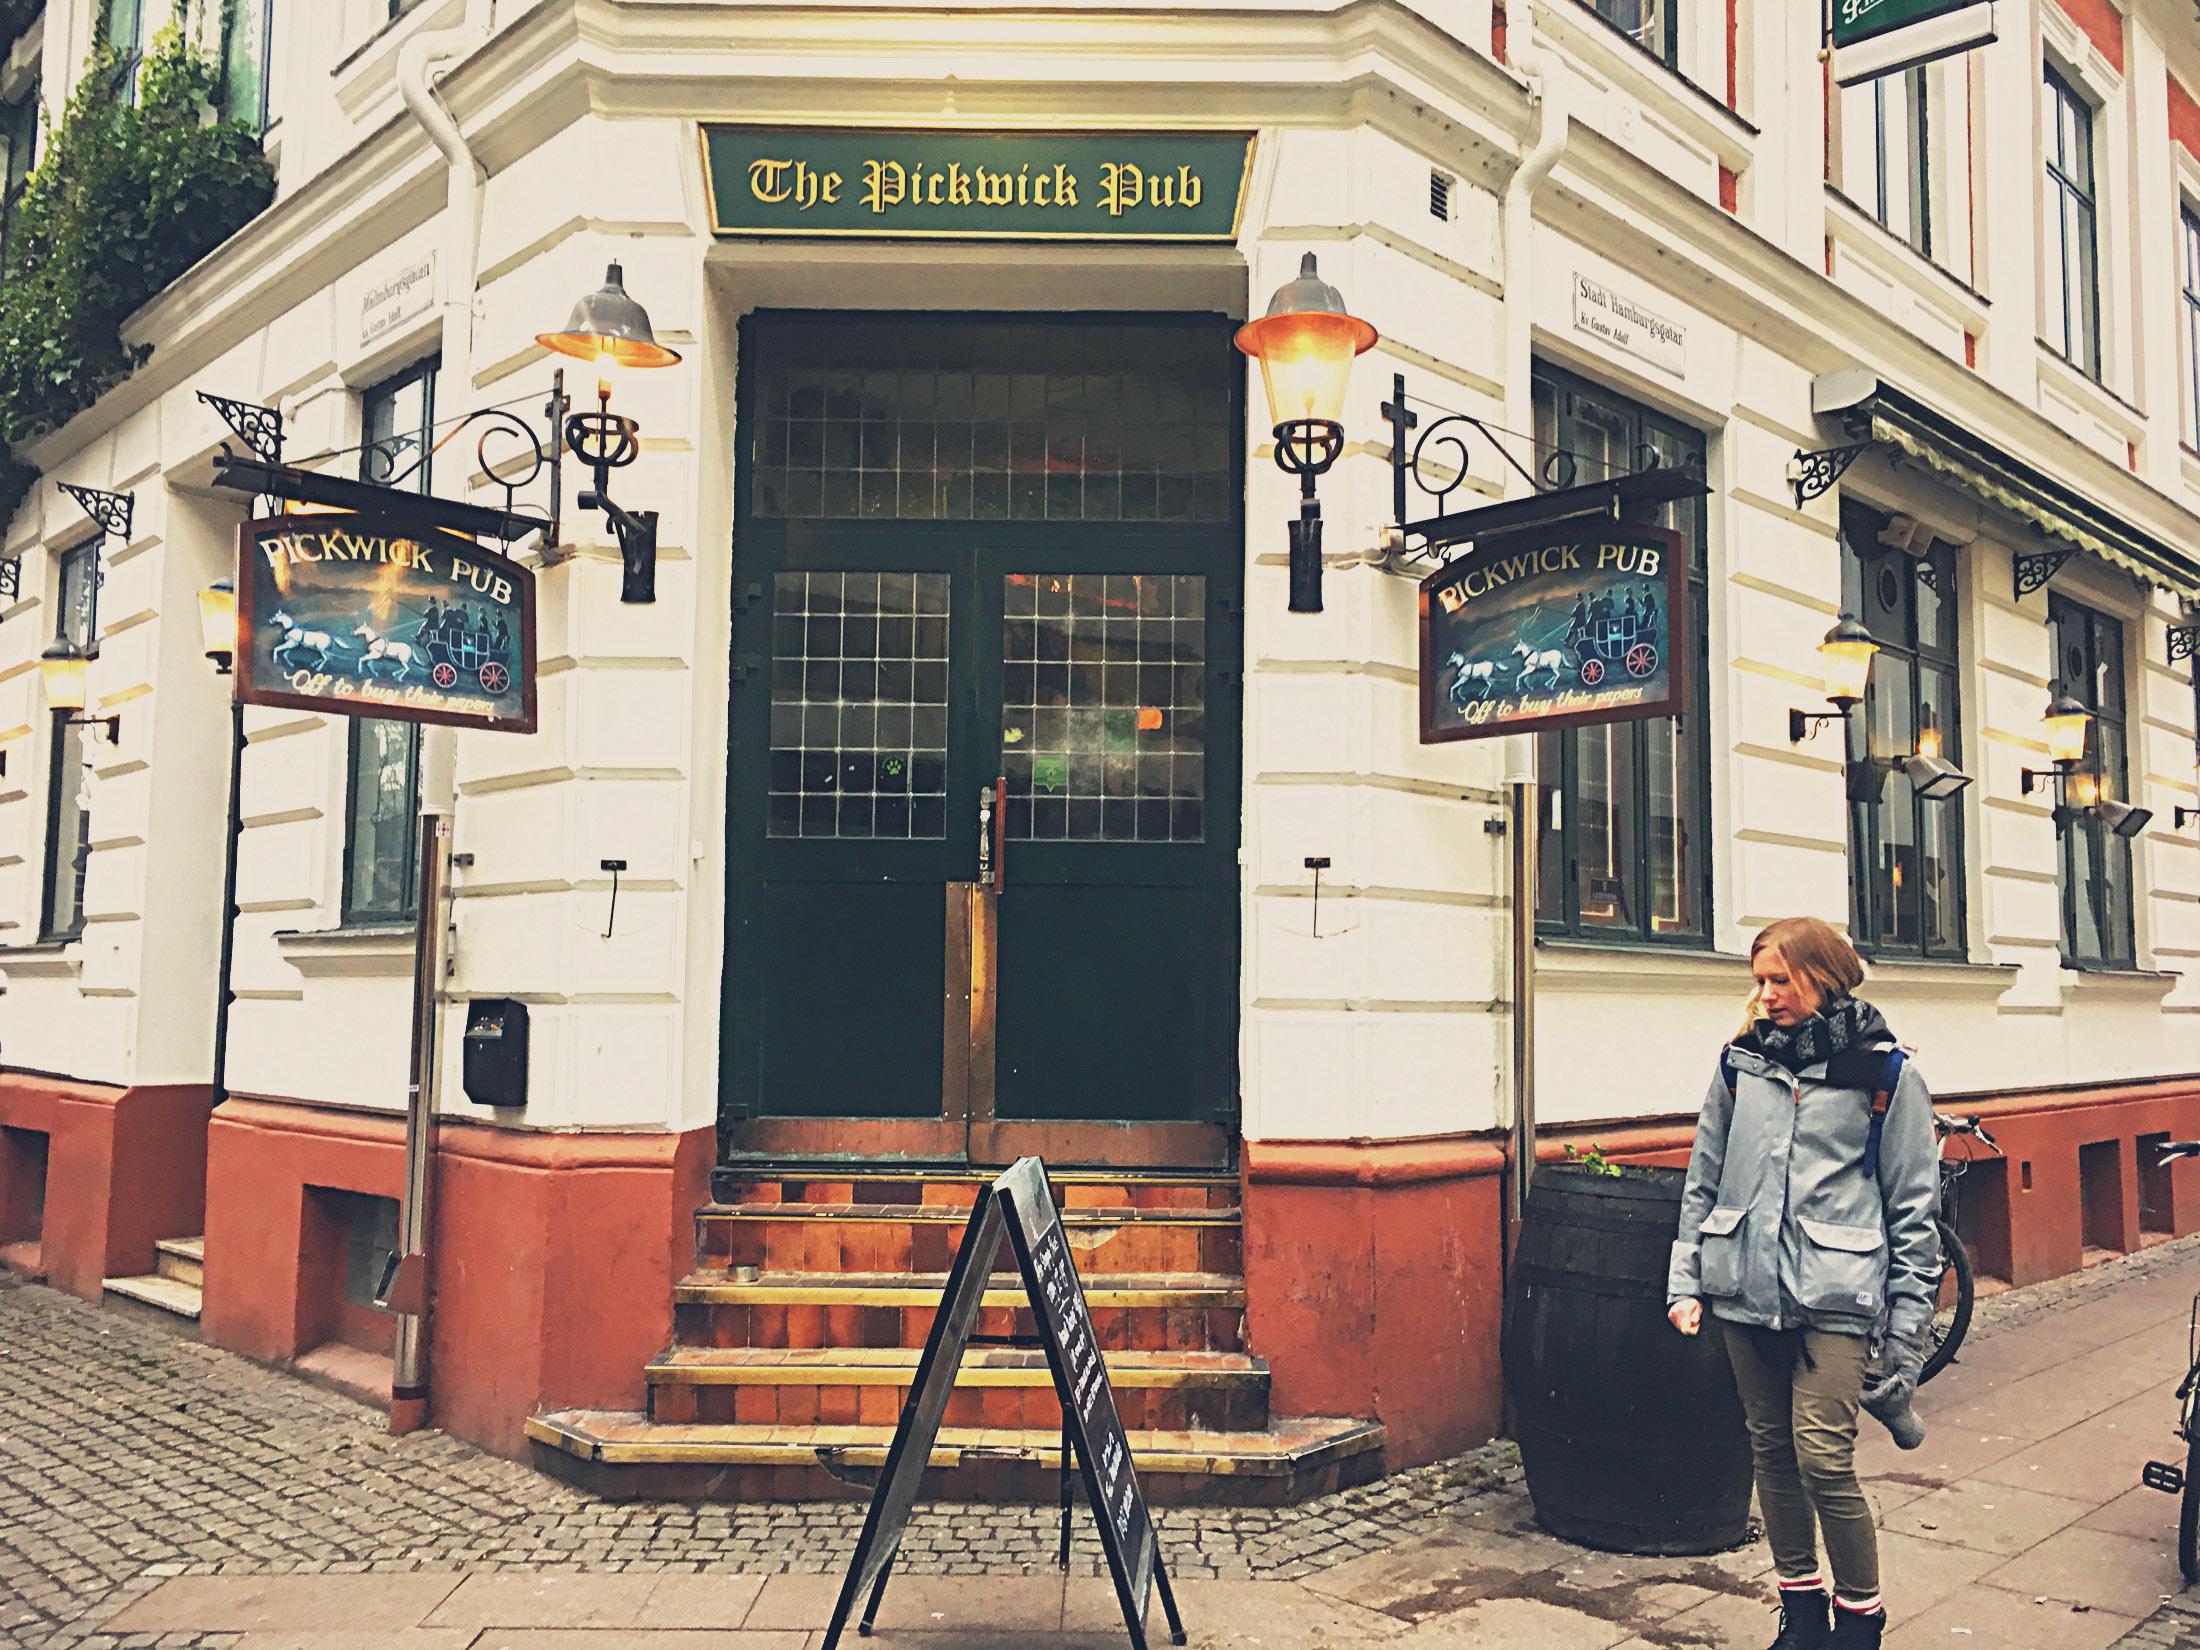 Pickwick pub